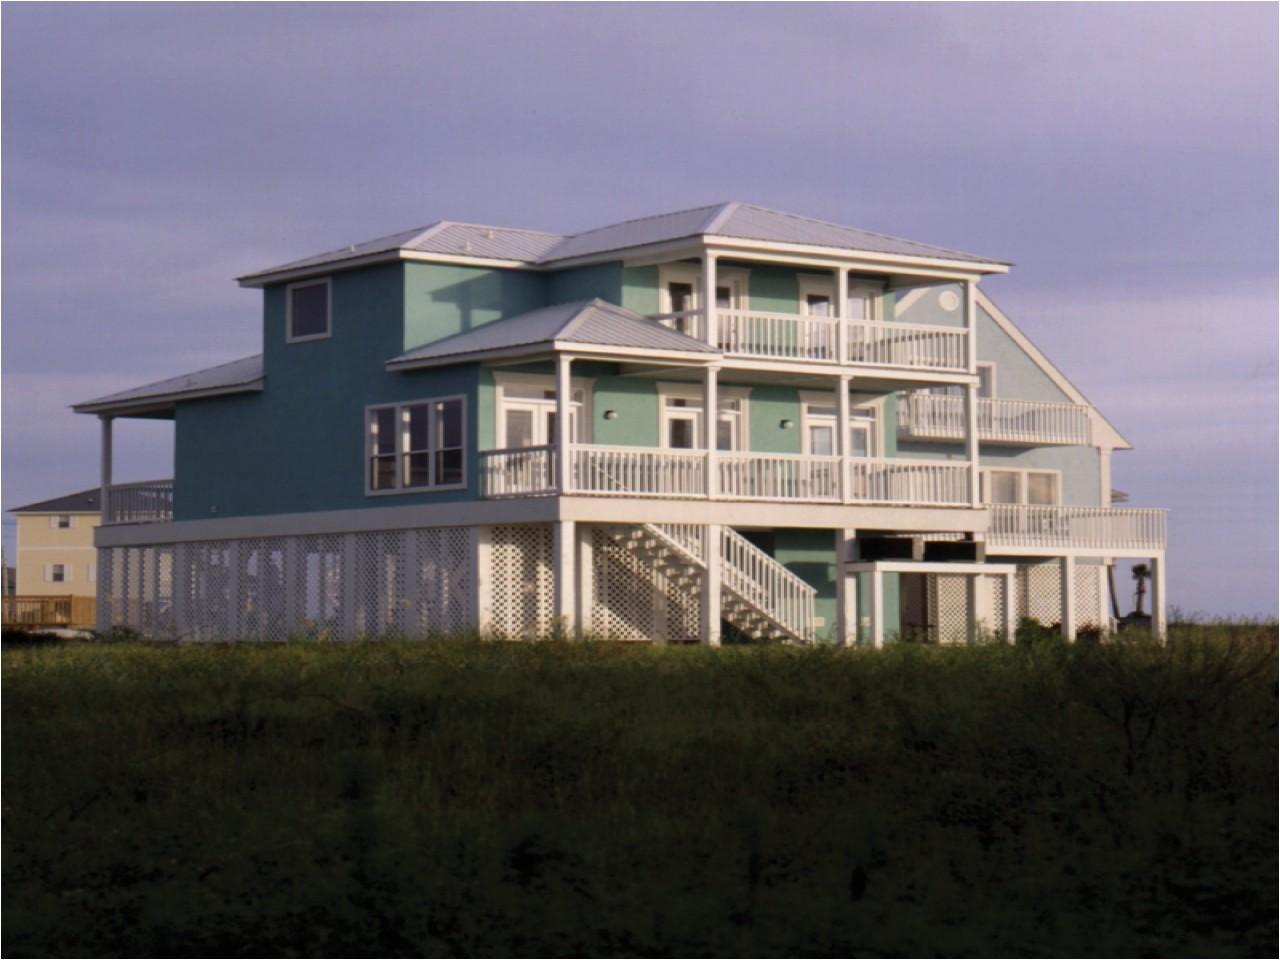 acb70e66775a4aab home plans raised beach house beach style house designs